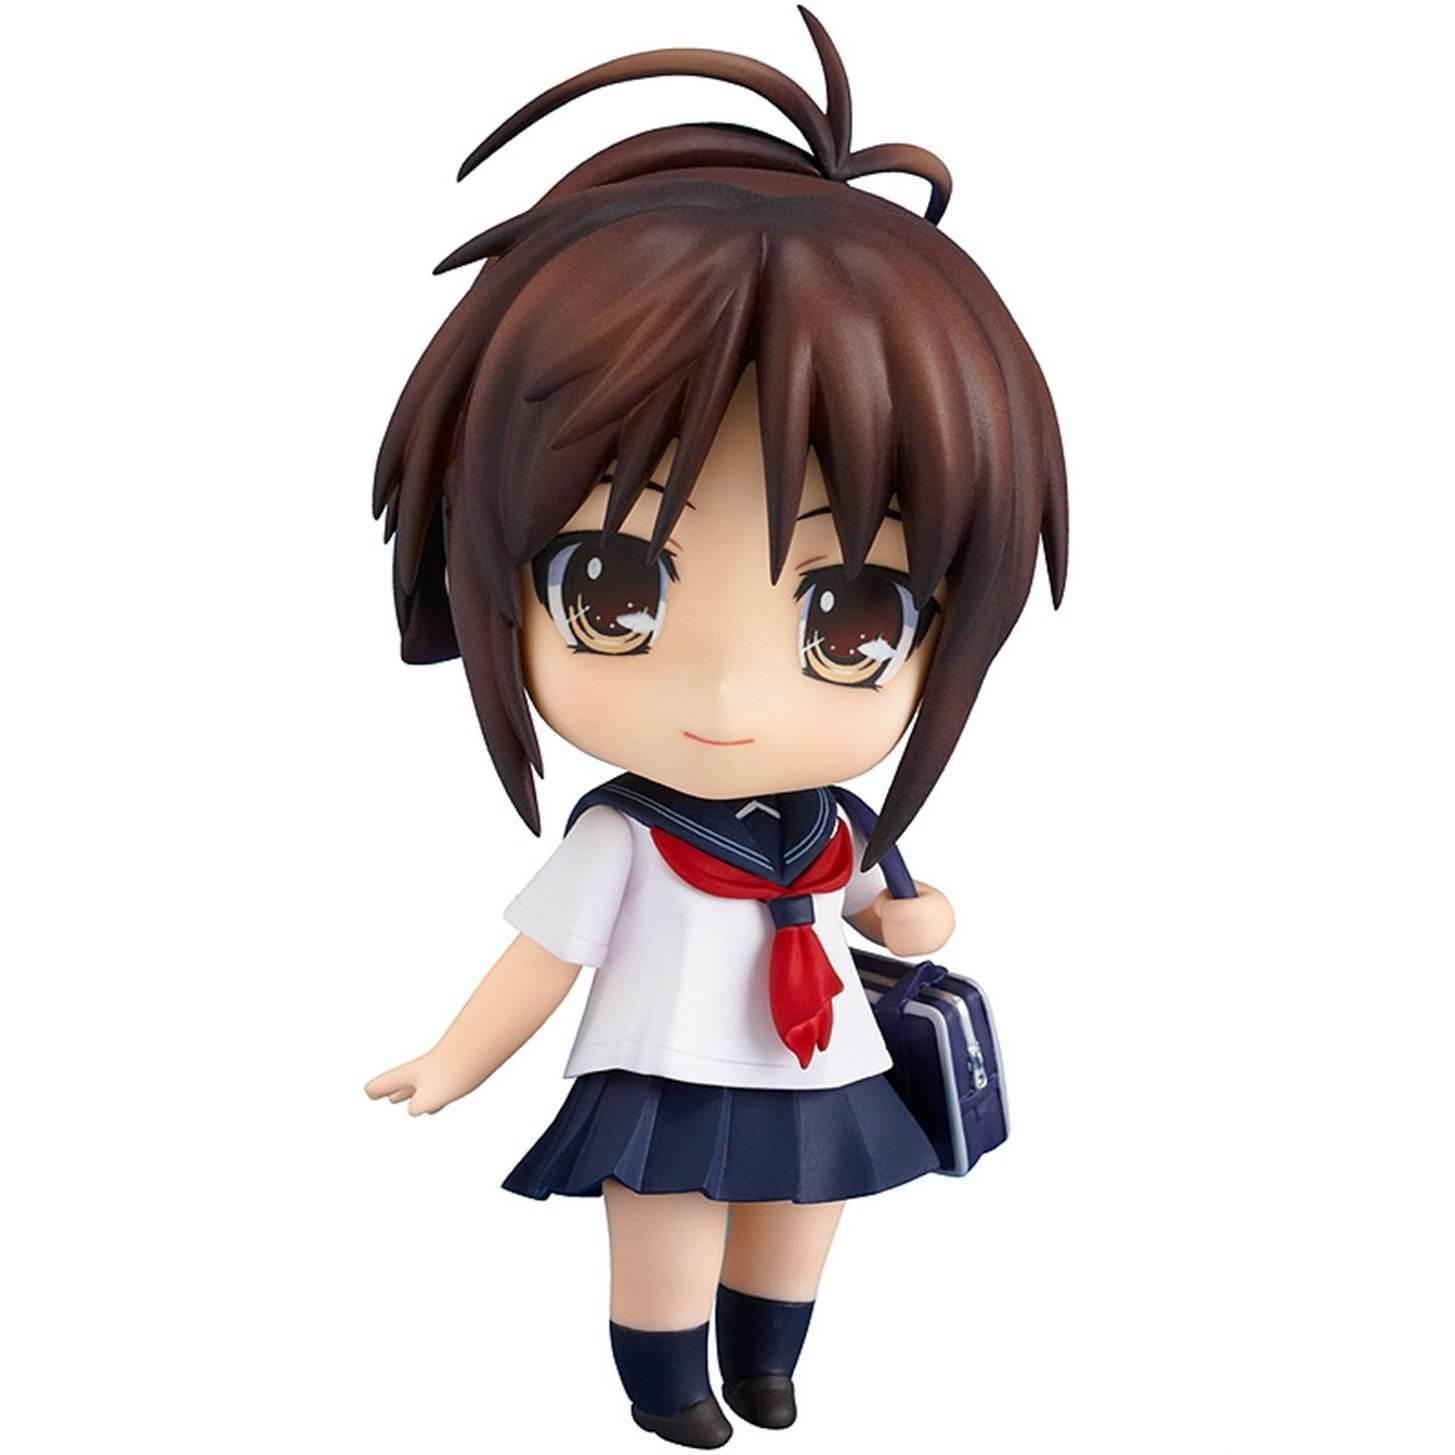 Minami Kawashima Nendoroid Action Figure